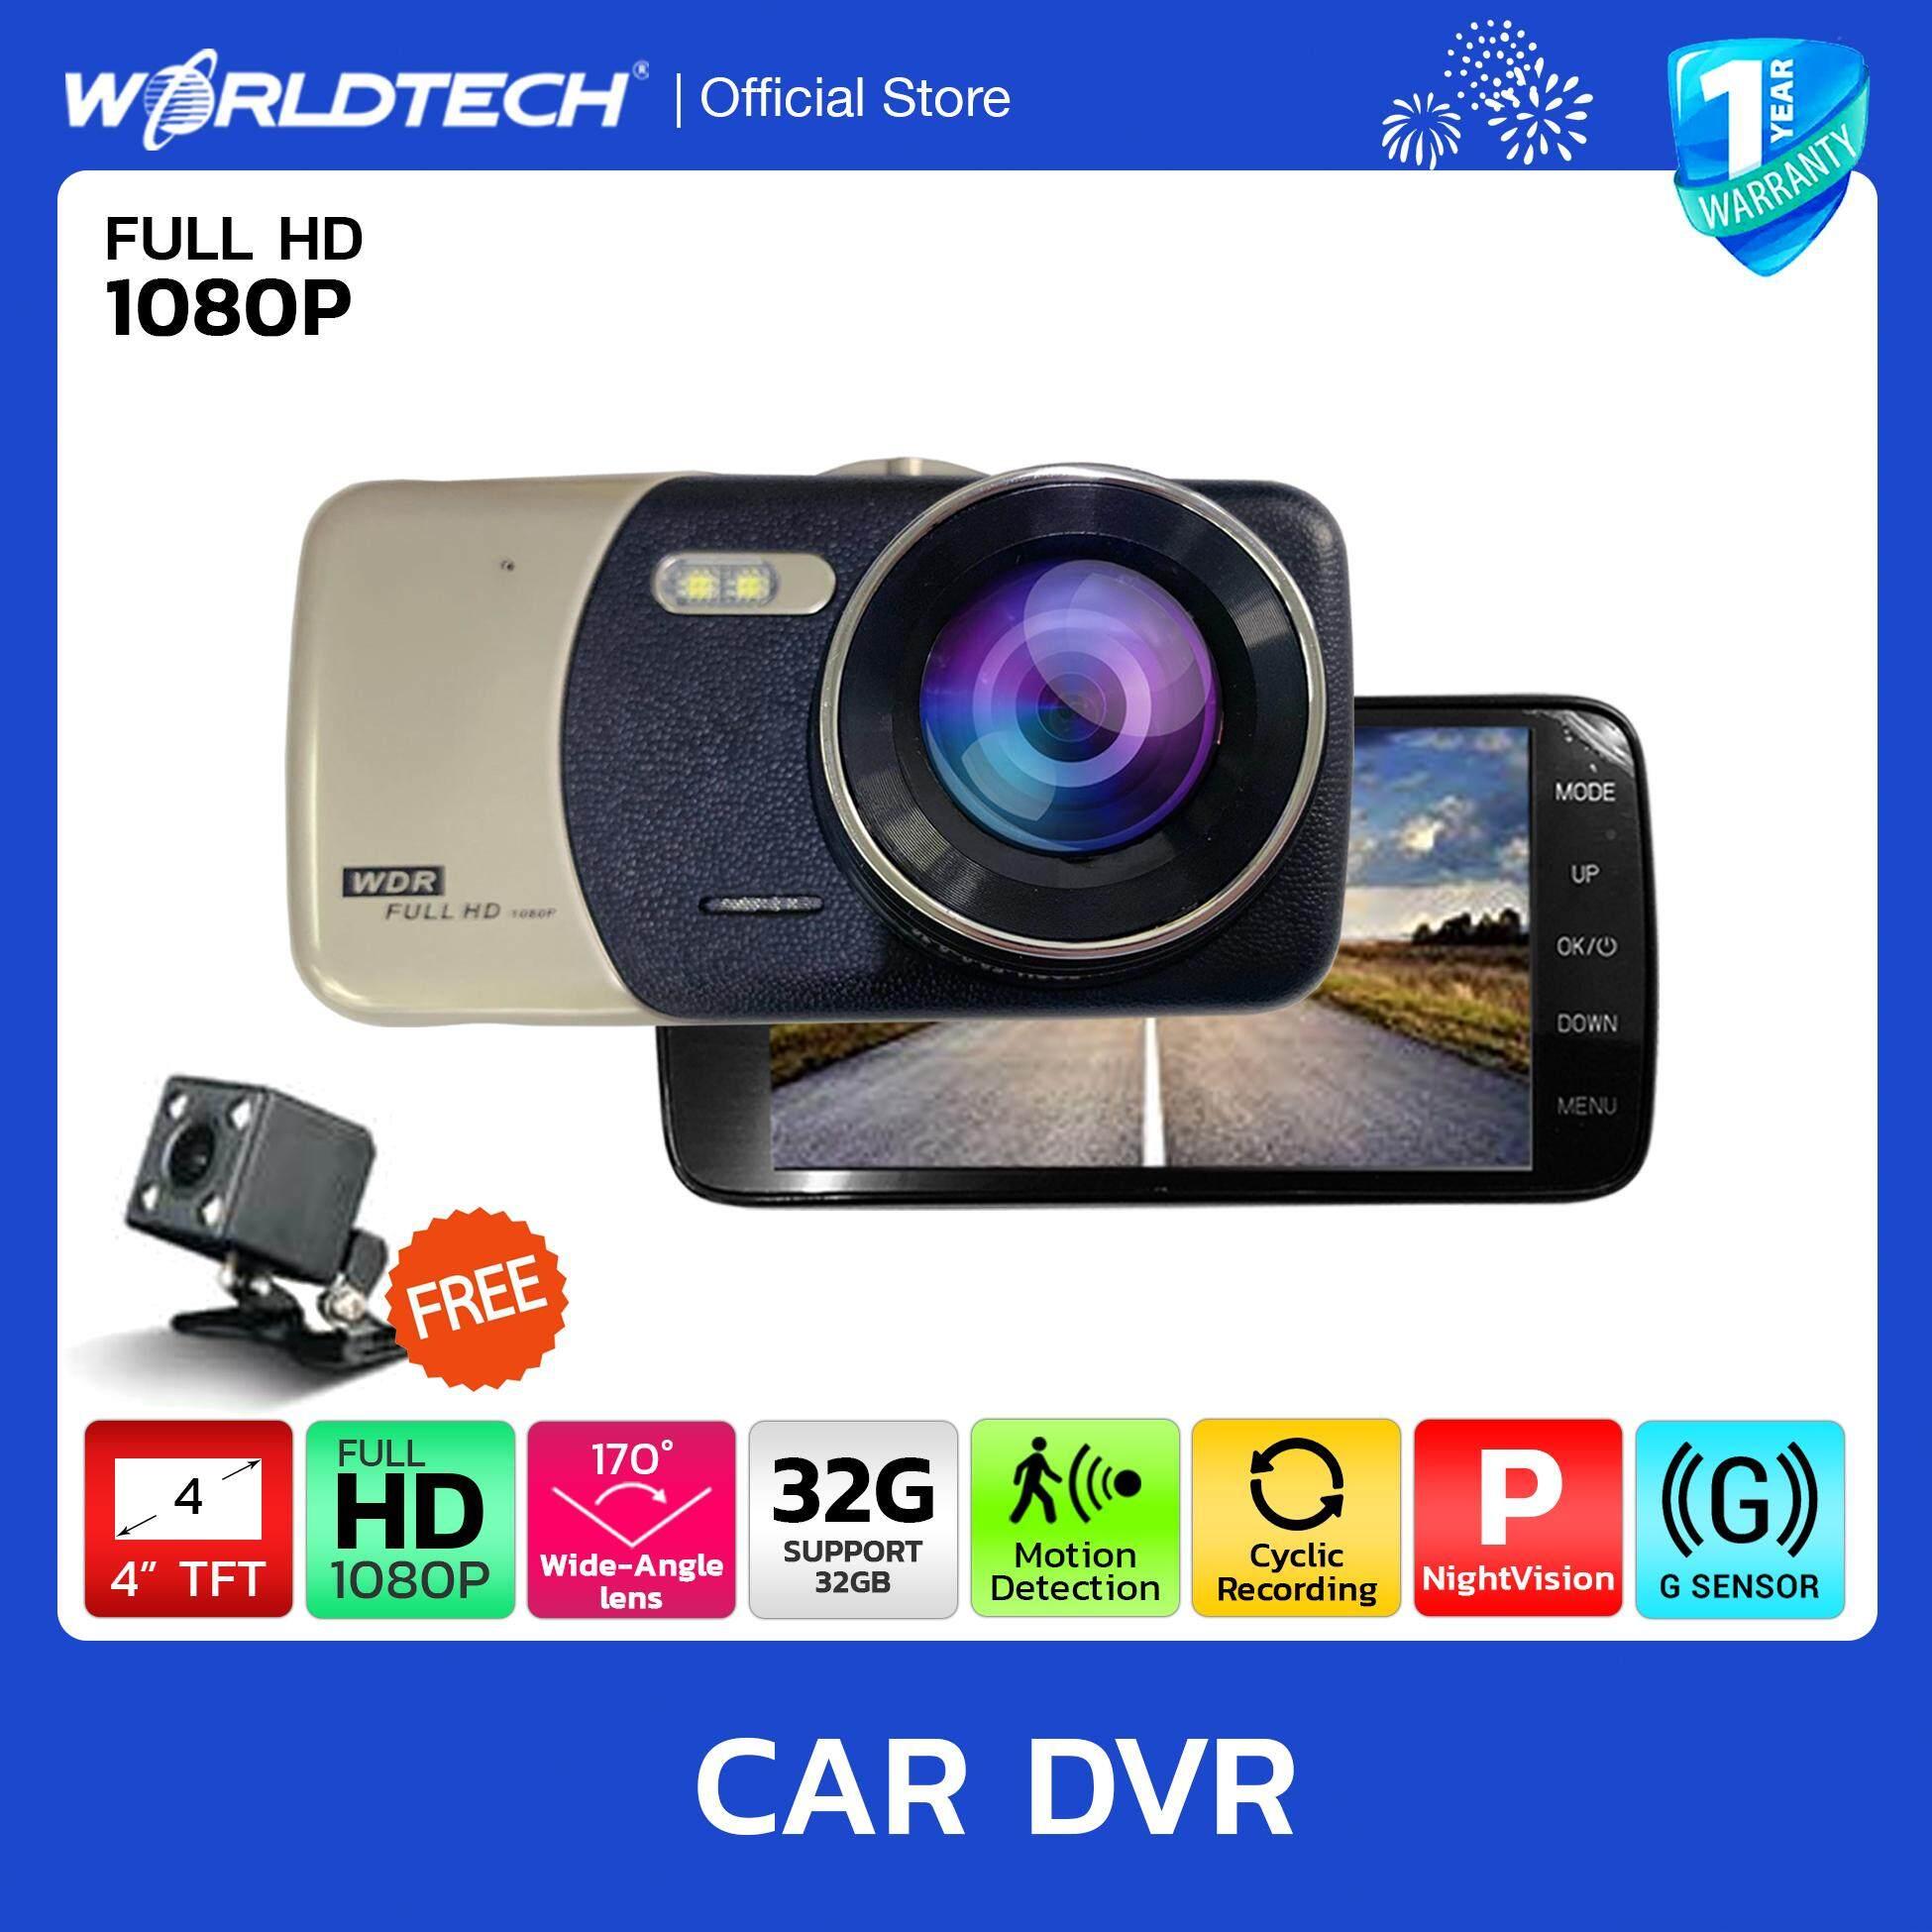 Worldtech กล้องติดรถยนต์ Car DVR Camera สีดำทอง แบบ Full HD รุ่น WT-474DVR/19 แถมฟรี !!! กล้องมองหลัง